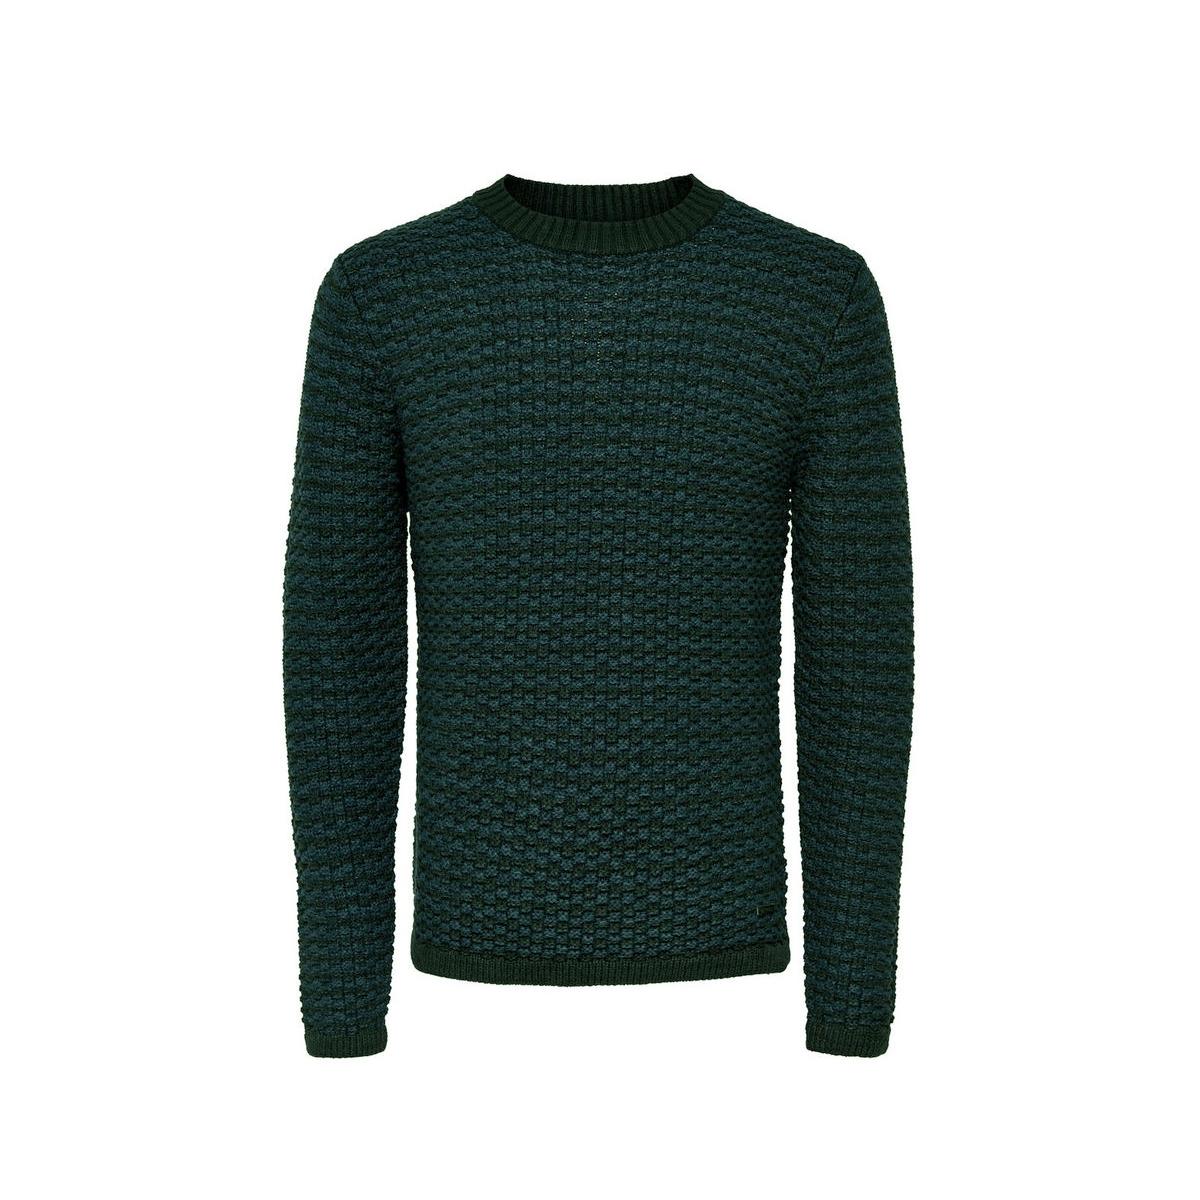 onsdoc crew neck knit noos 22004485 only & sons trui darkest spruce